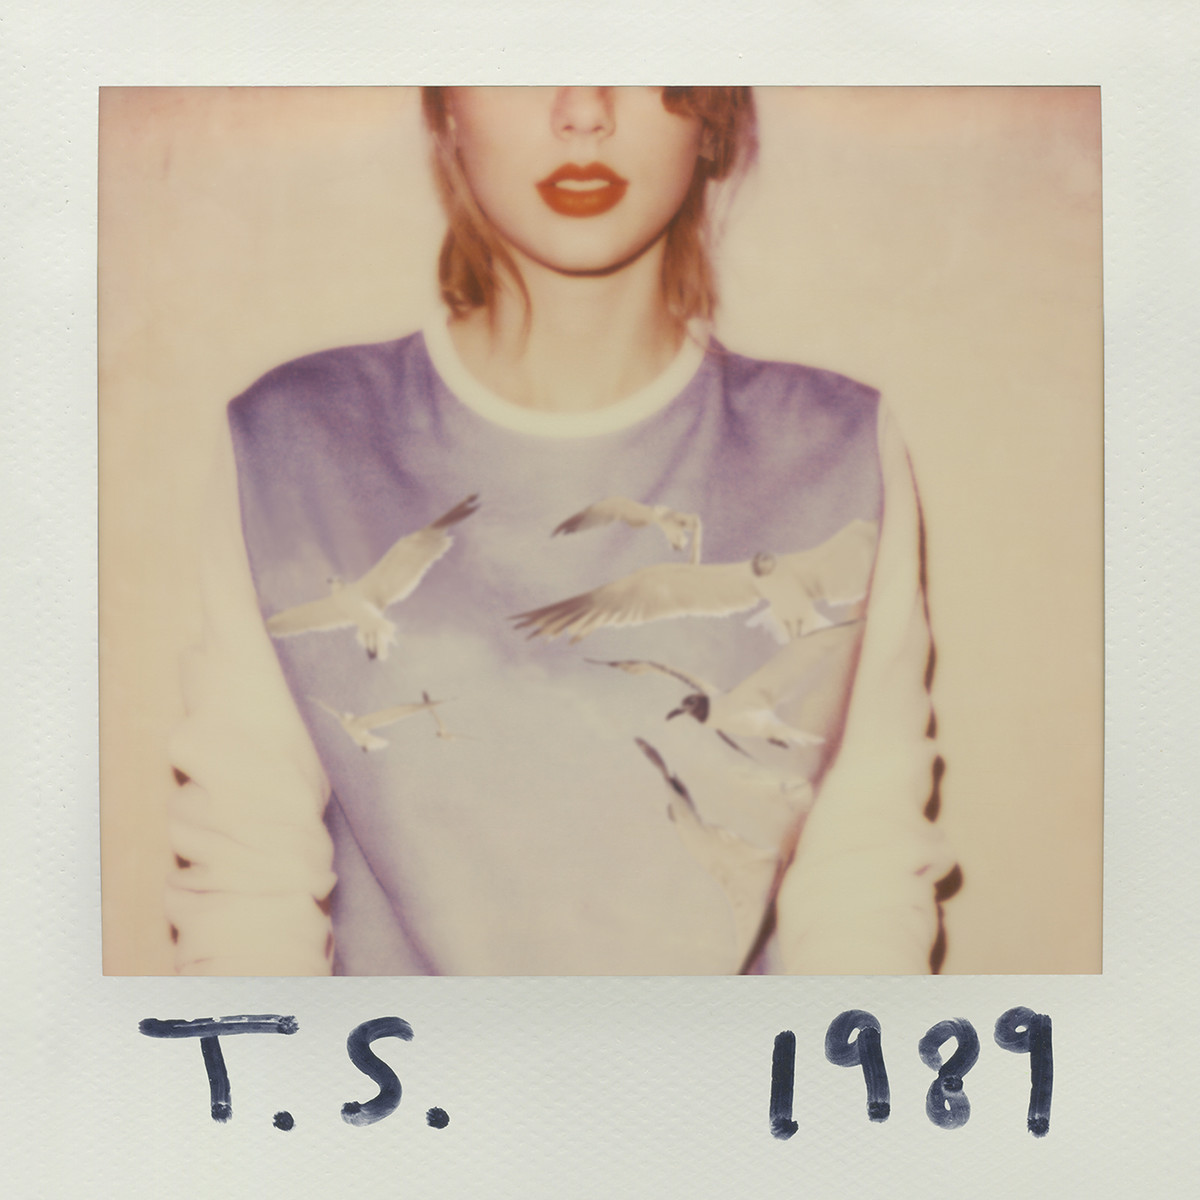 Premature Evaluation Taylor Swift 1989 Stereogum